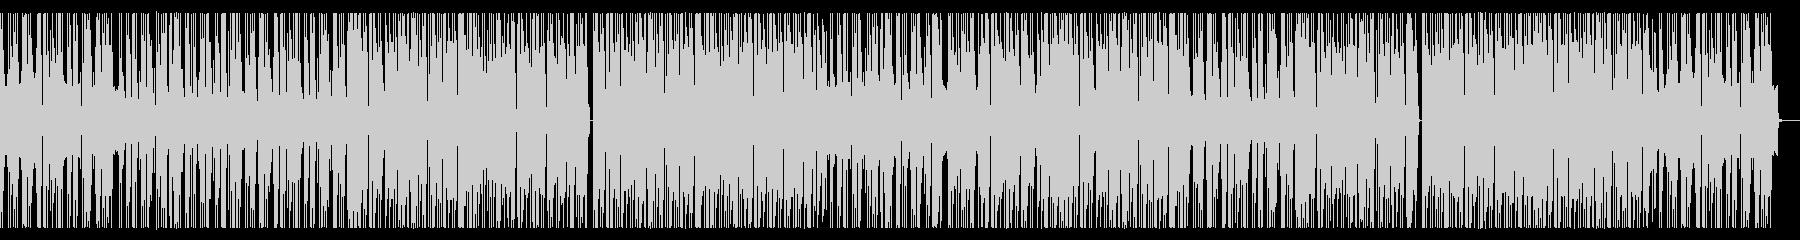 HIPHOP調のオープニングの未再生の波形